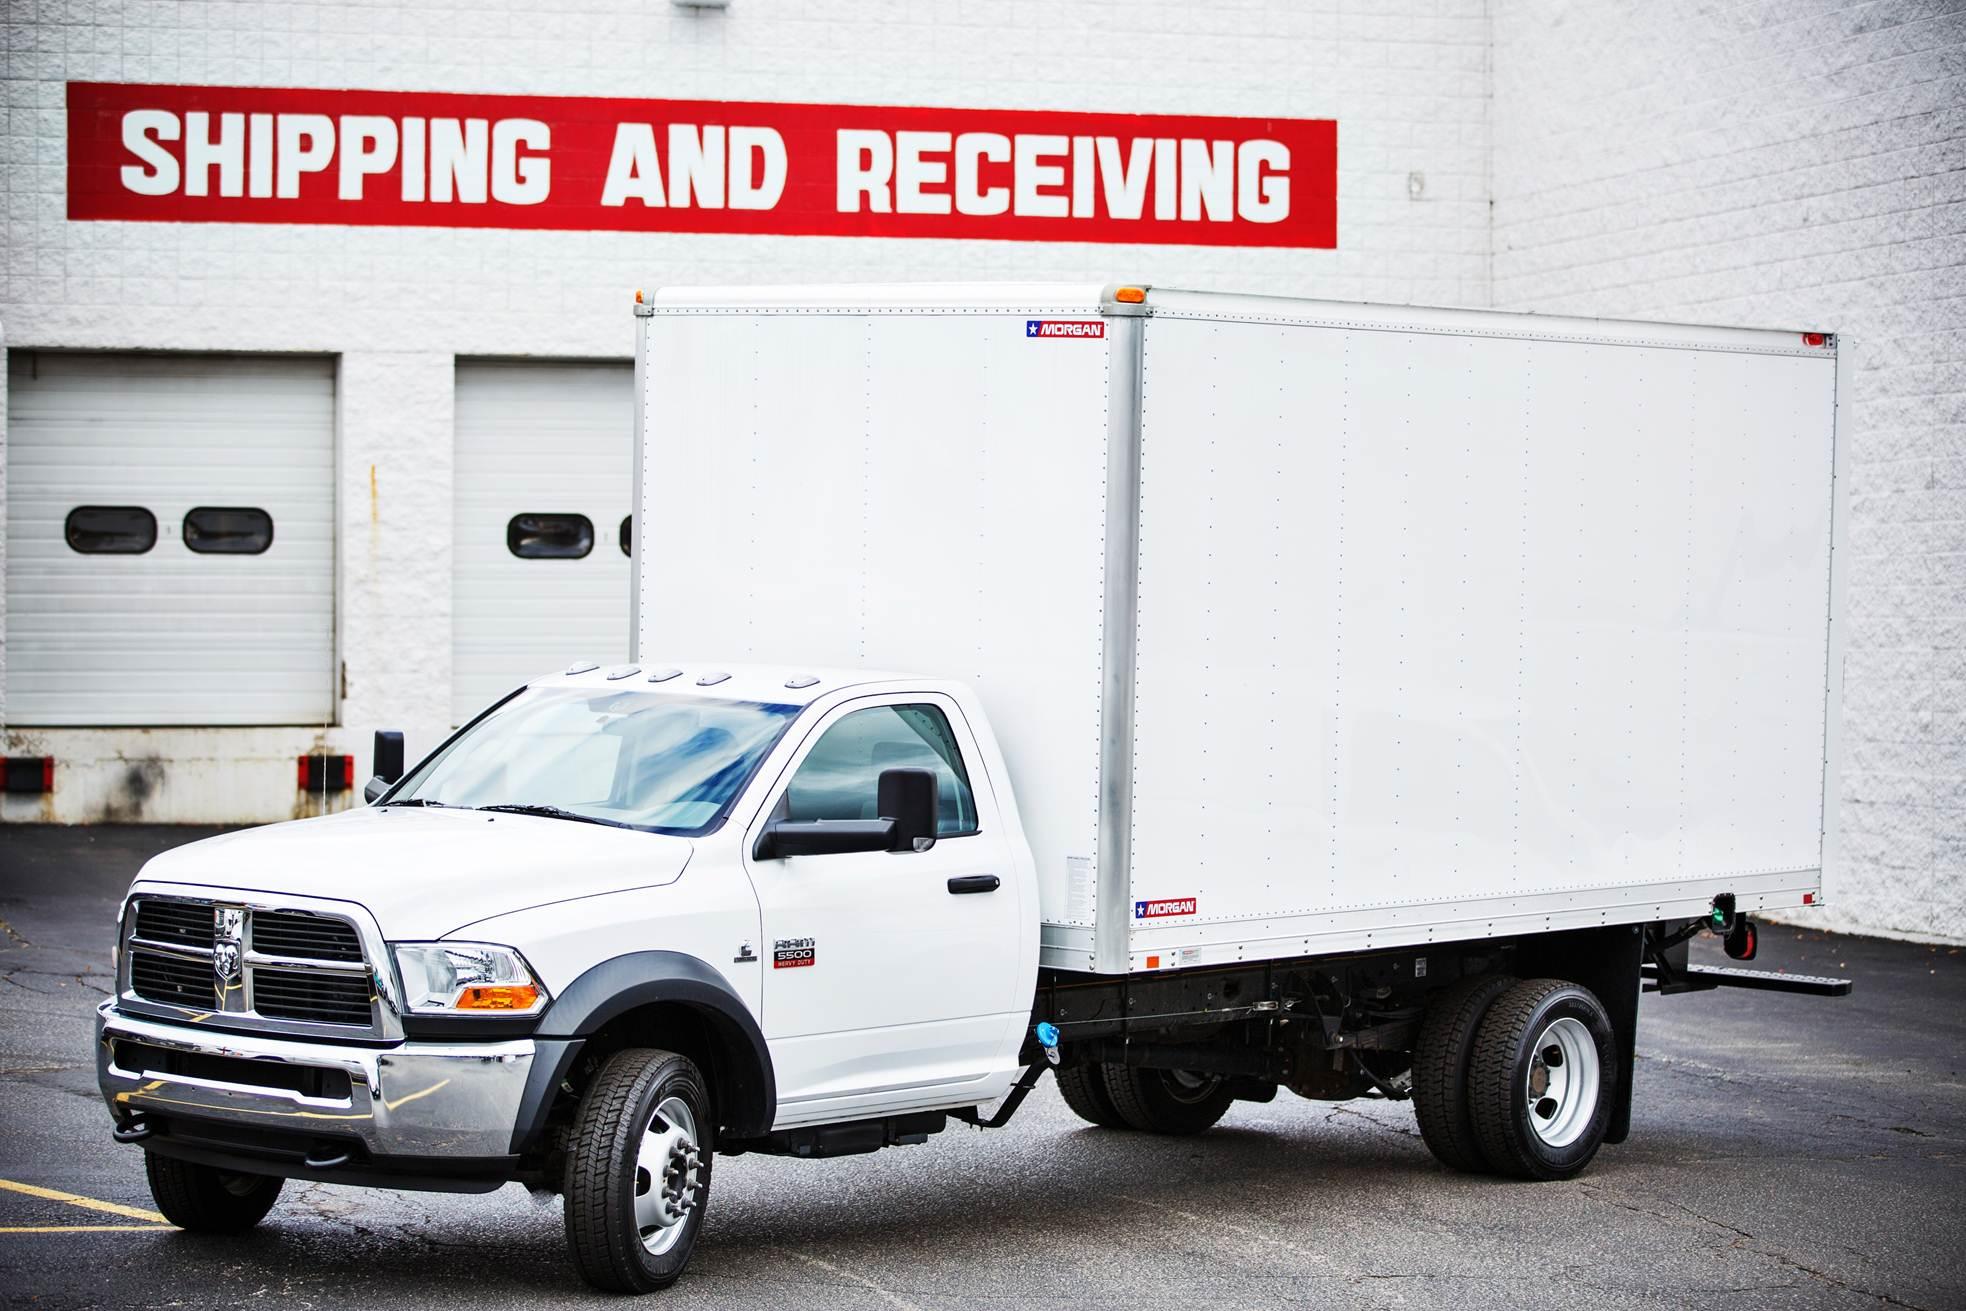 Dodge ram 2500 research new used dodge ram 2500 trucks for Bruner motors stephenville dodge